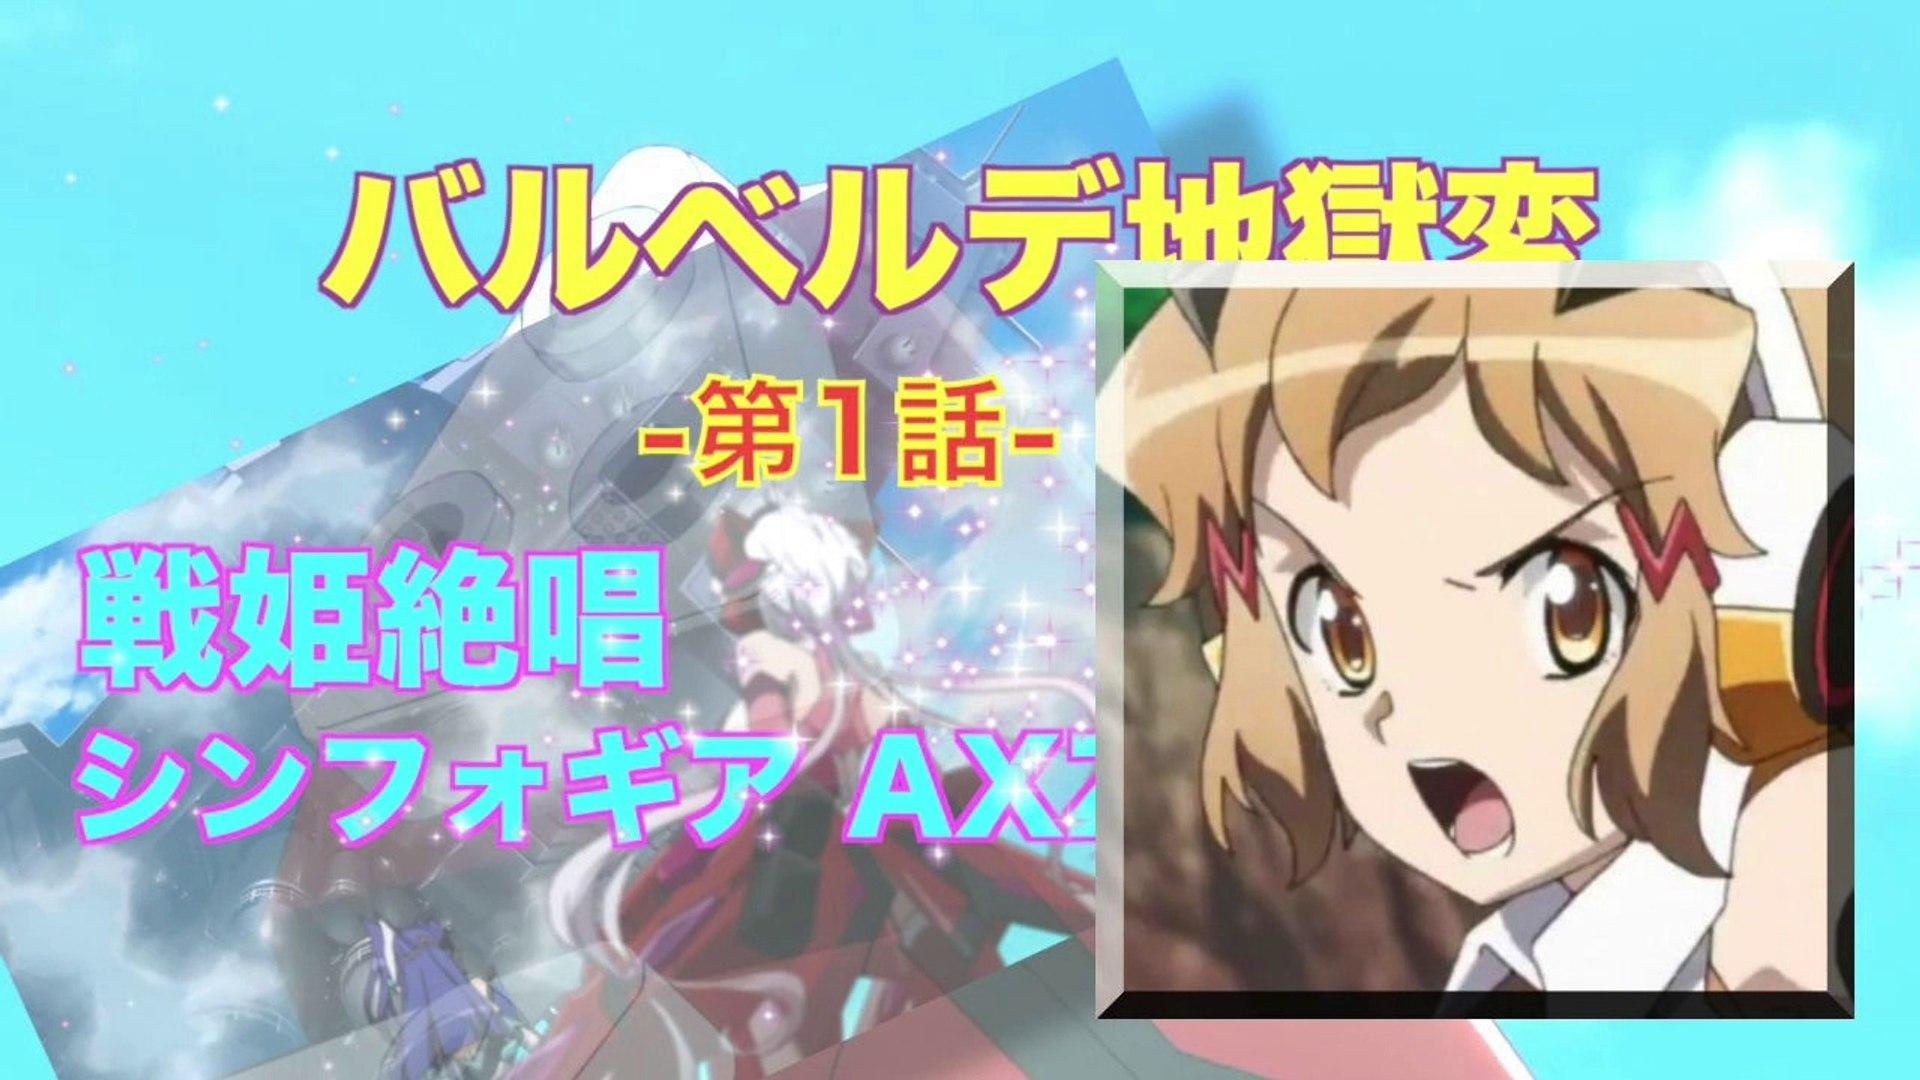 Symphogear Axz 戦姫絶唱シンフォギア Axz 第1話 バルベルデ地獄変 Hd